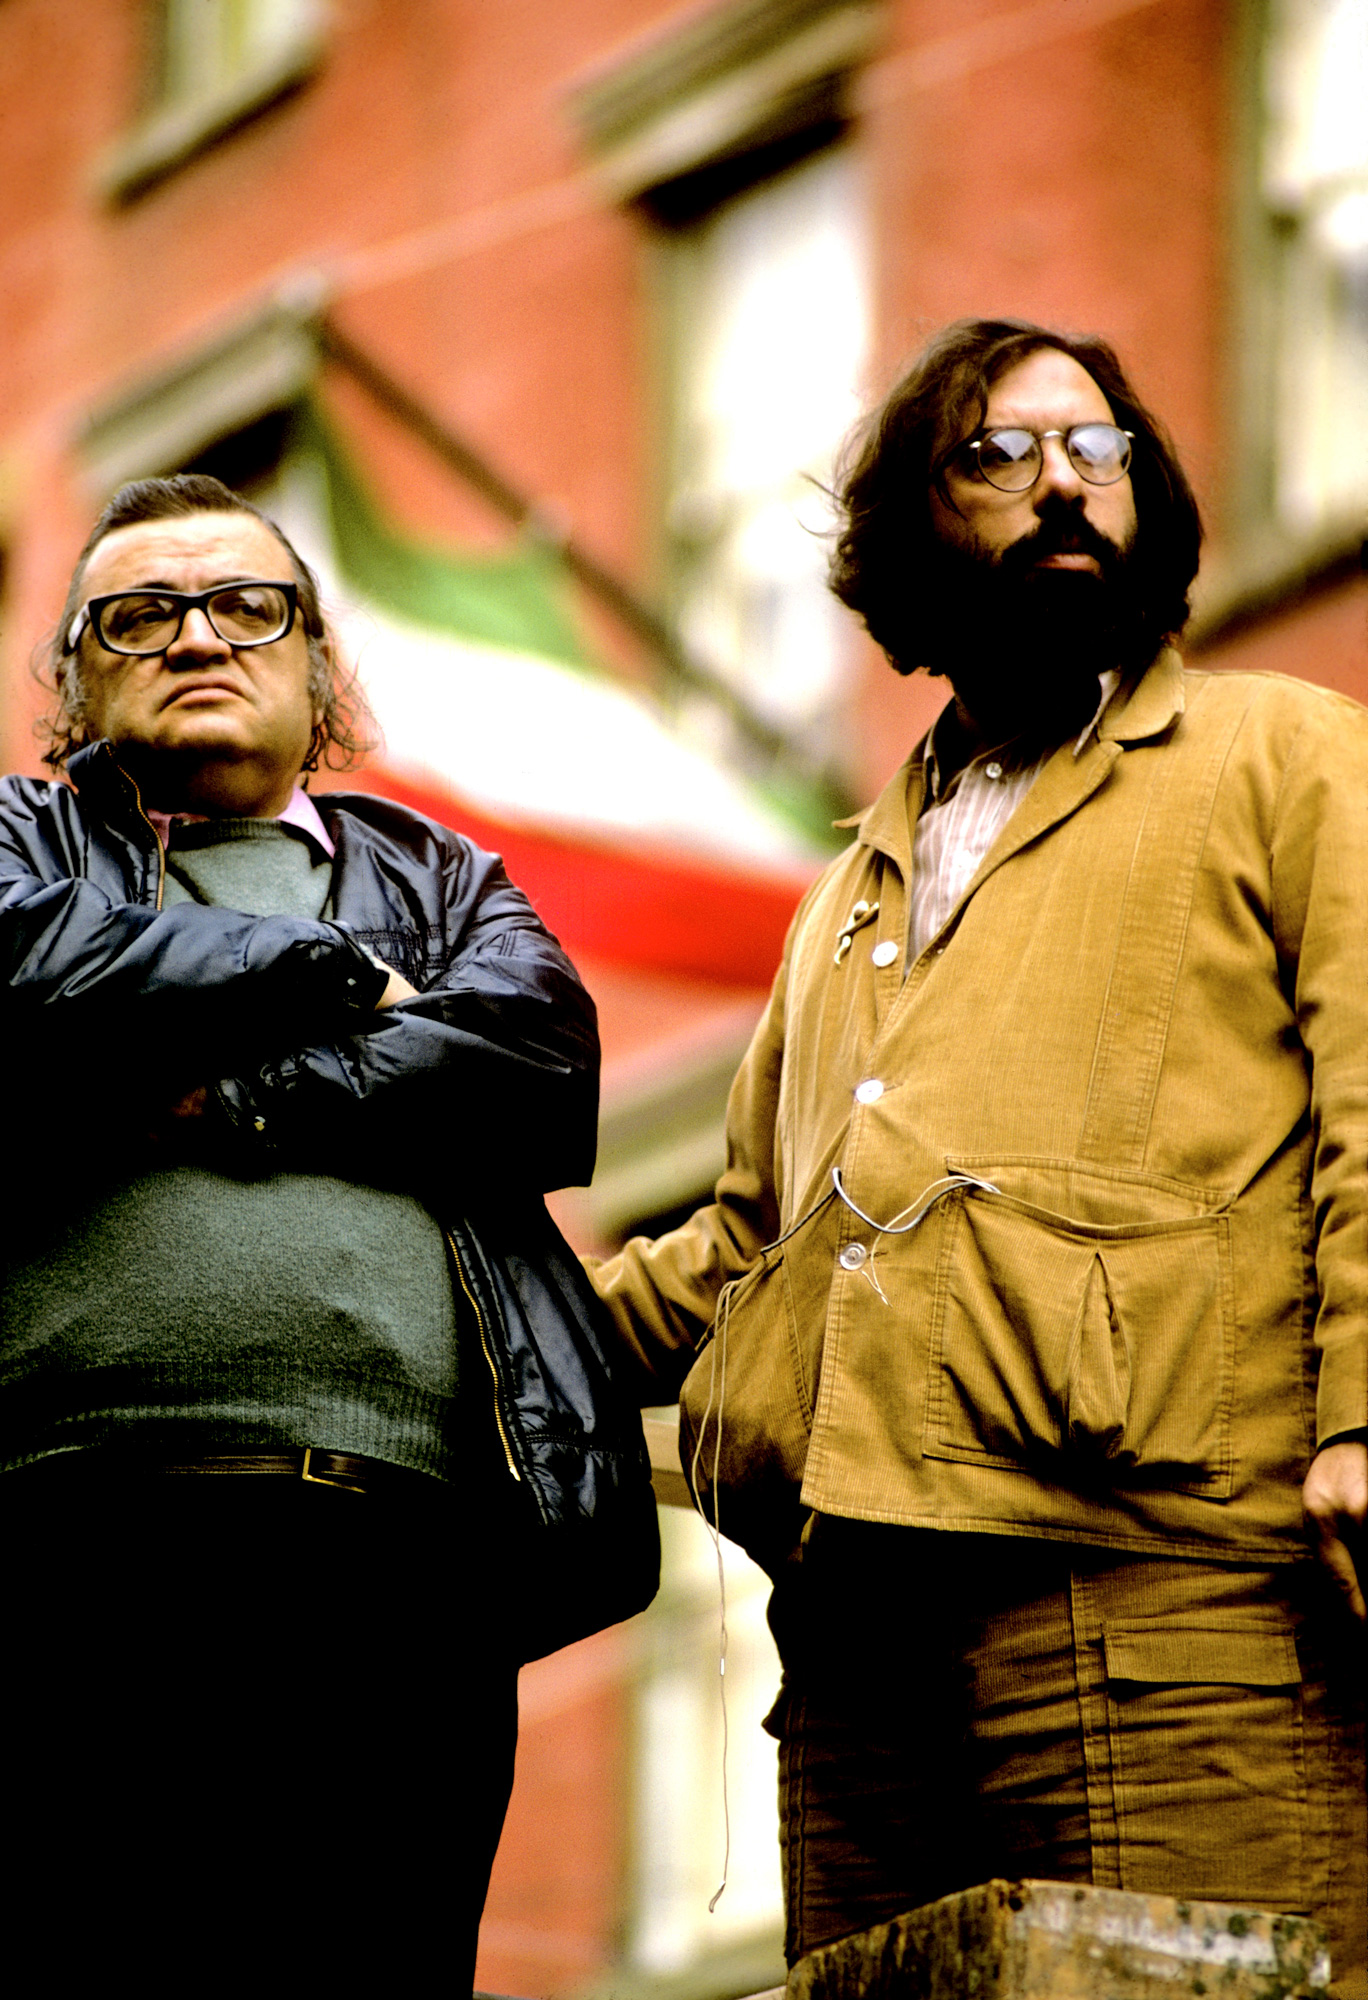 Mario Puzo and Francis Ford Coppola, Photo: Steve Schapiro/Corbis